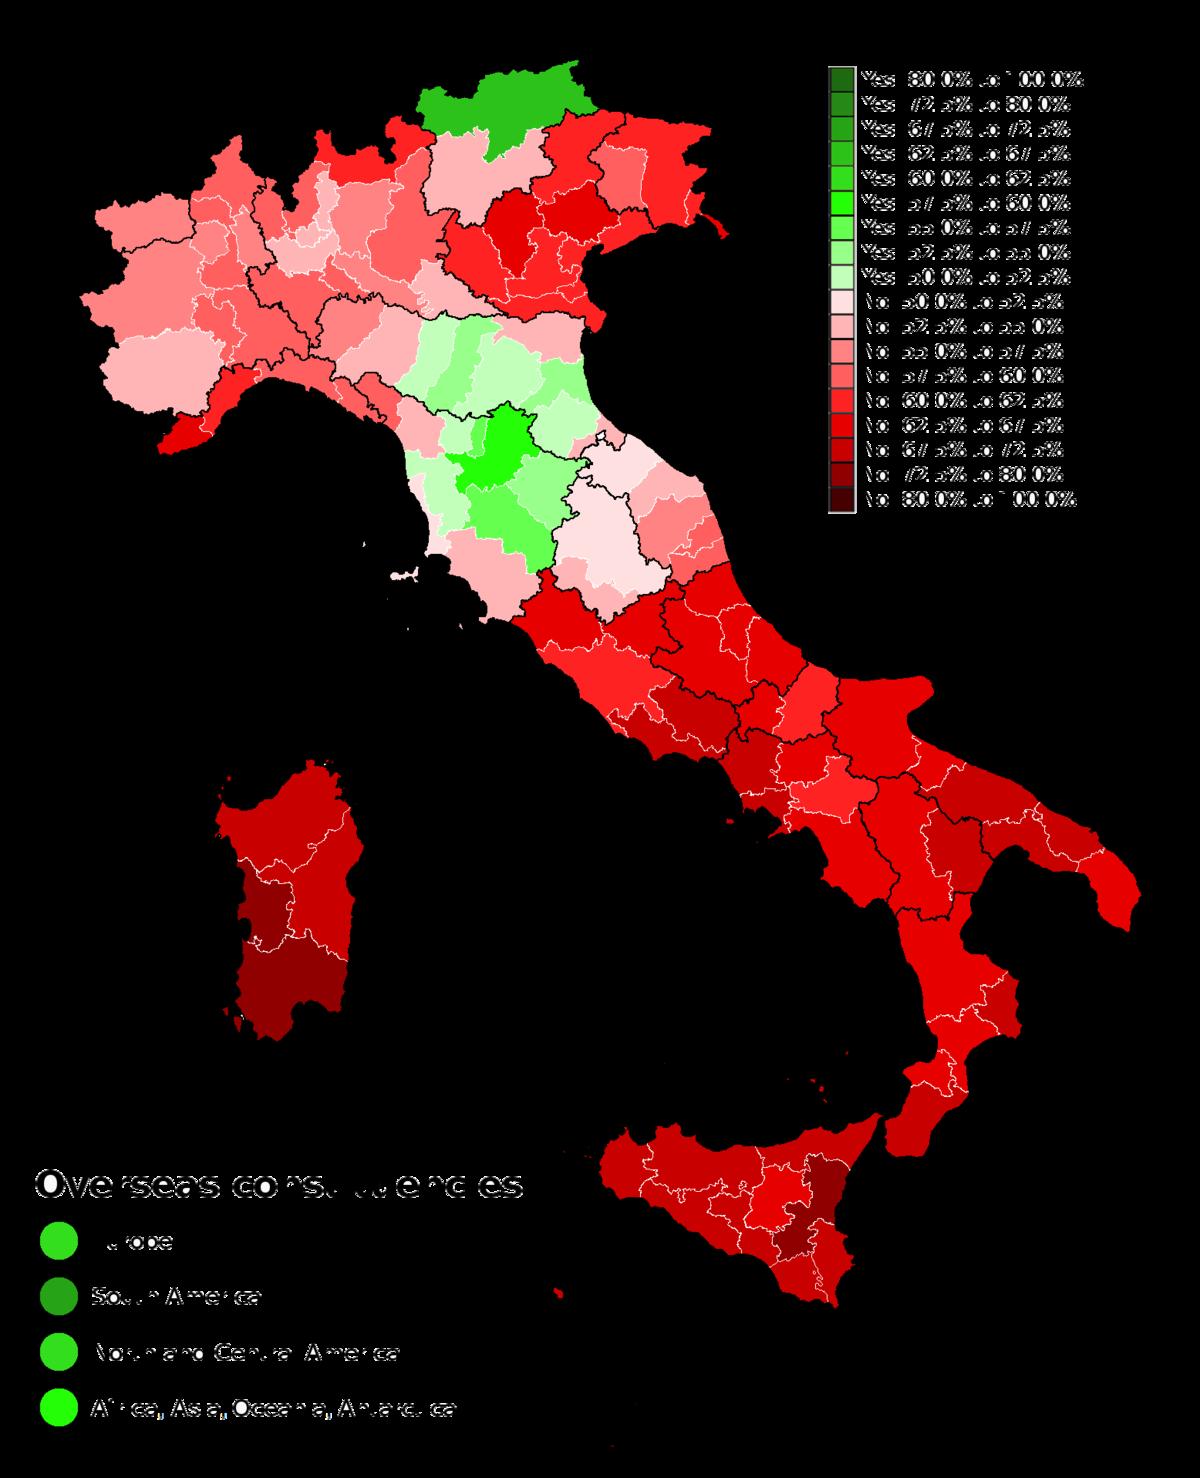 italian constitutional referendum 2016 wikipedia. Black Bedroom Furniture Sets. Home Design Ideas